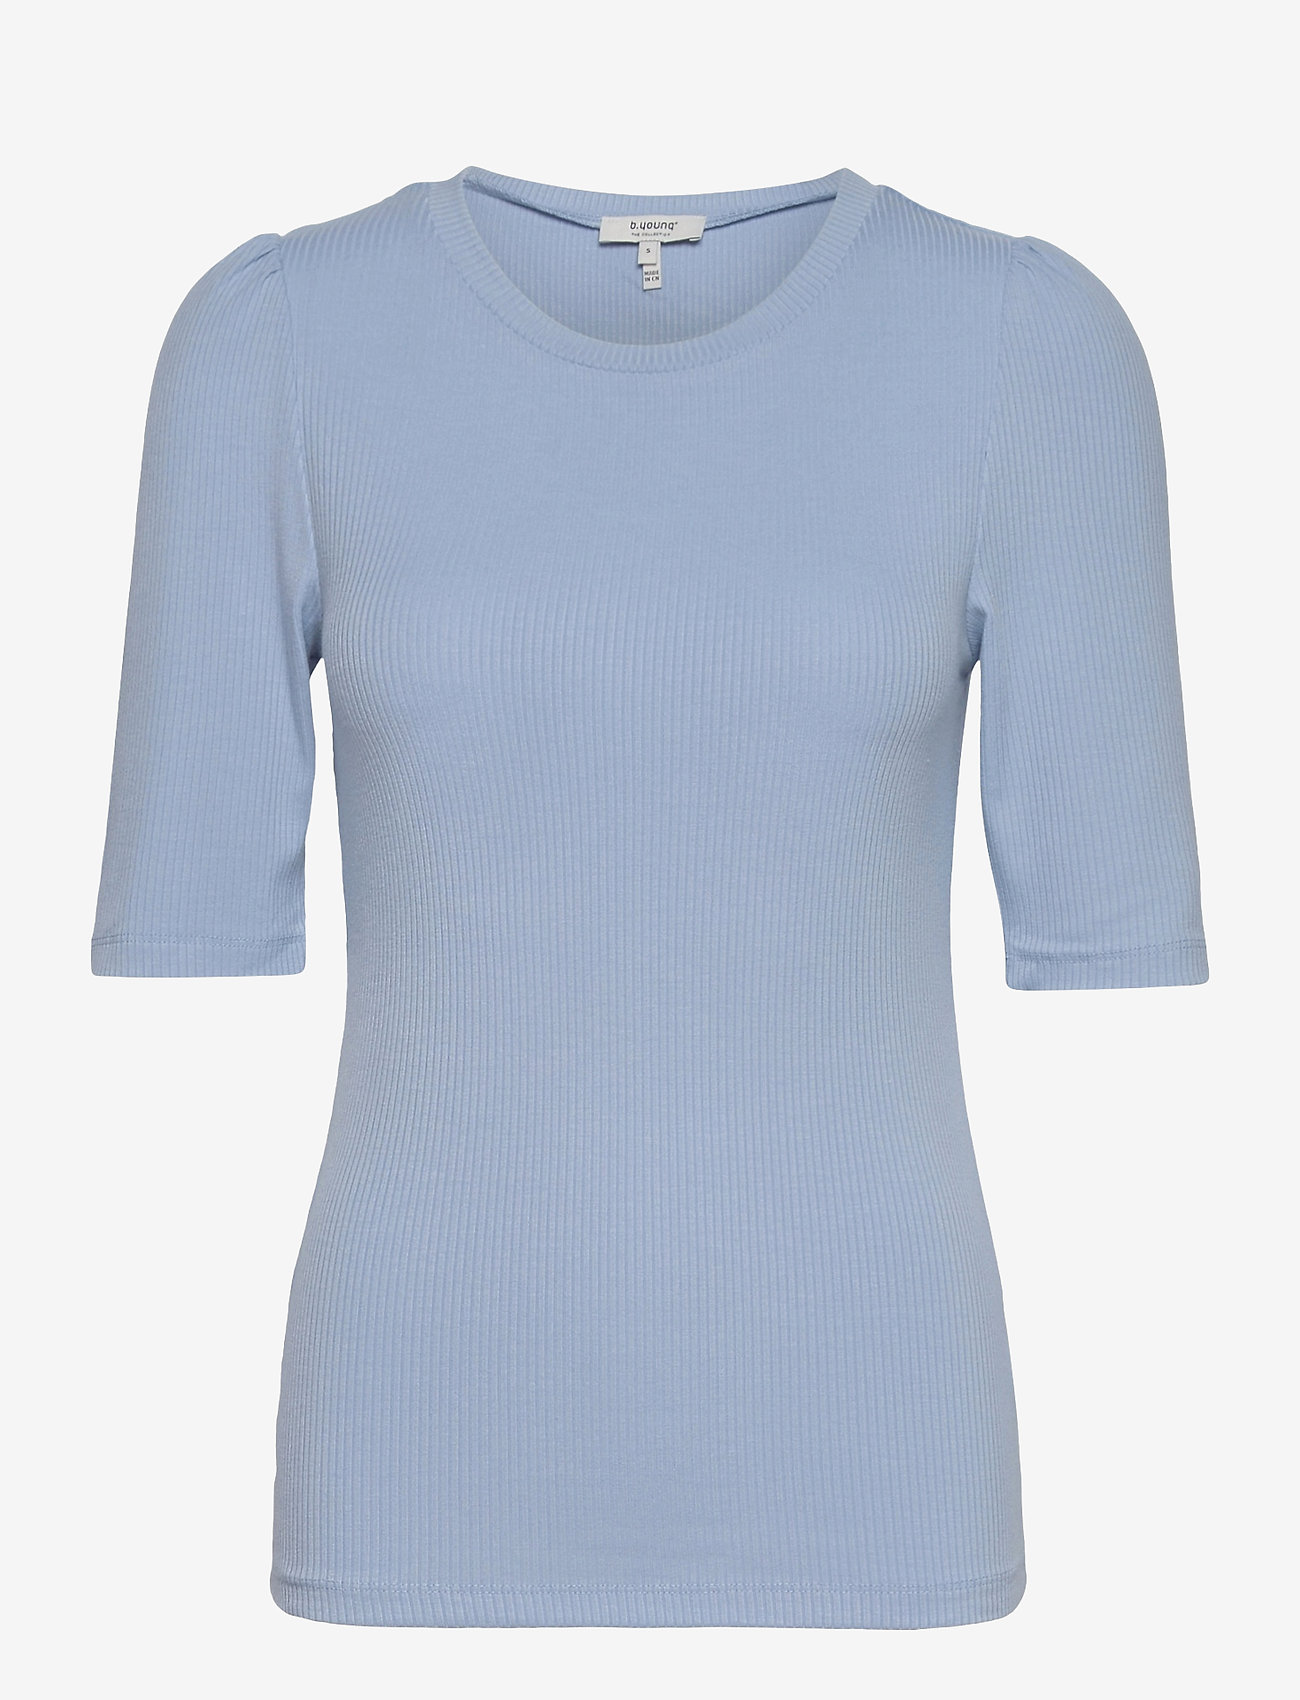 b.young - BYTOELLA PUFF - - t-shirts - brunnera blue - 0